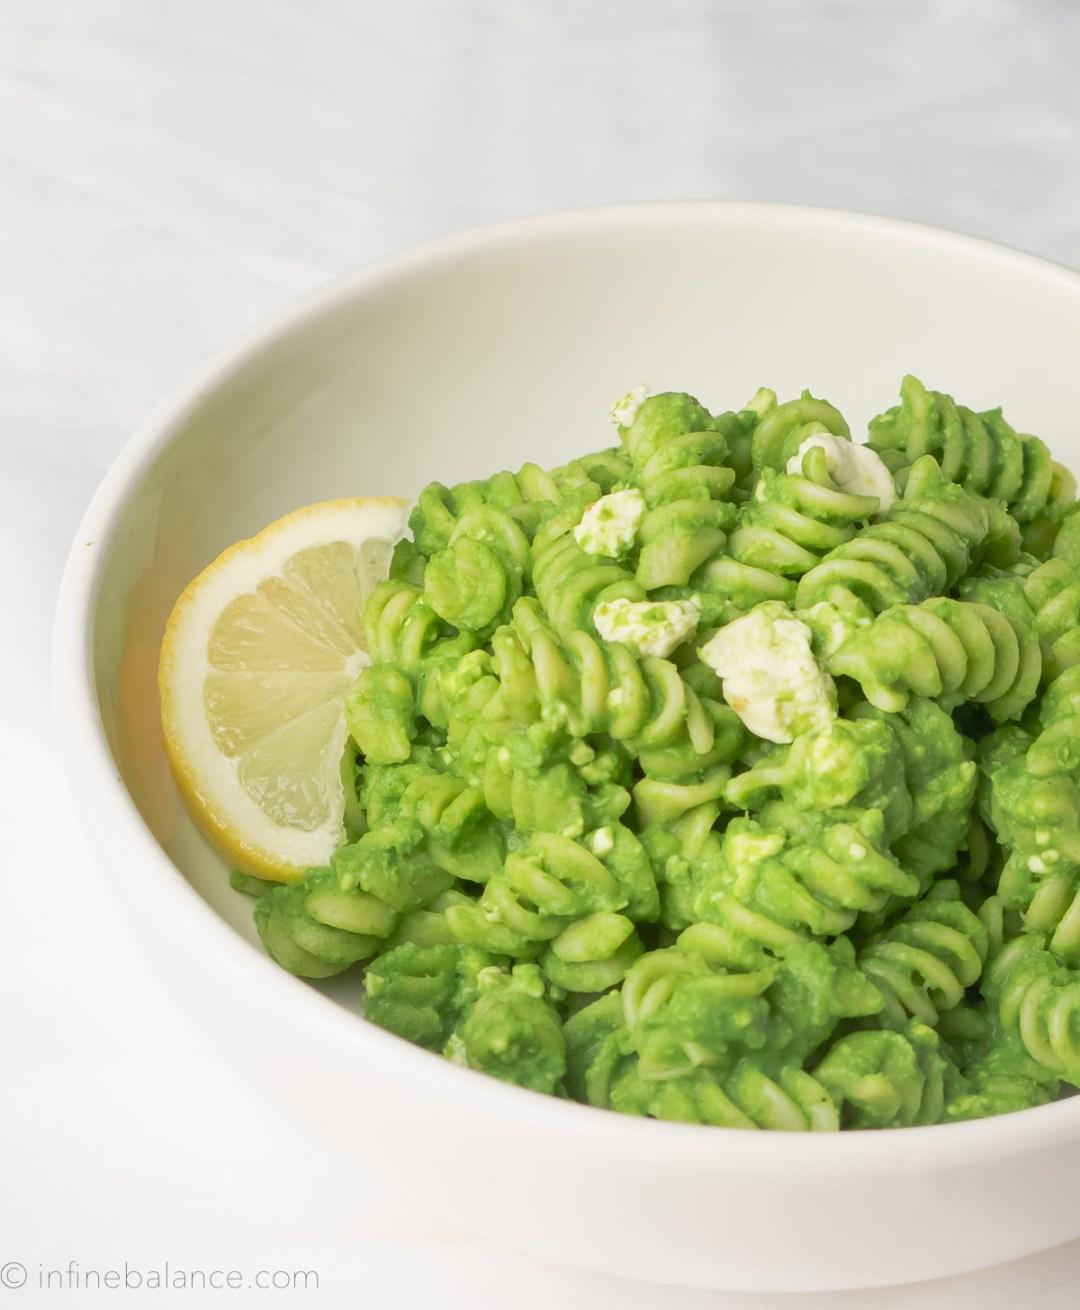 Green Pea Pasta | infinebalance  #dinner #recipe #vegetarian